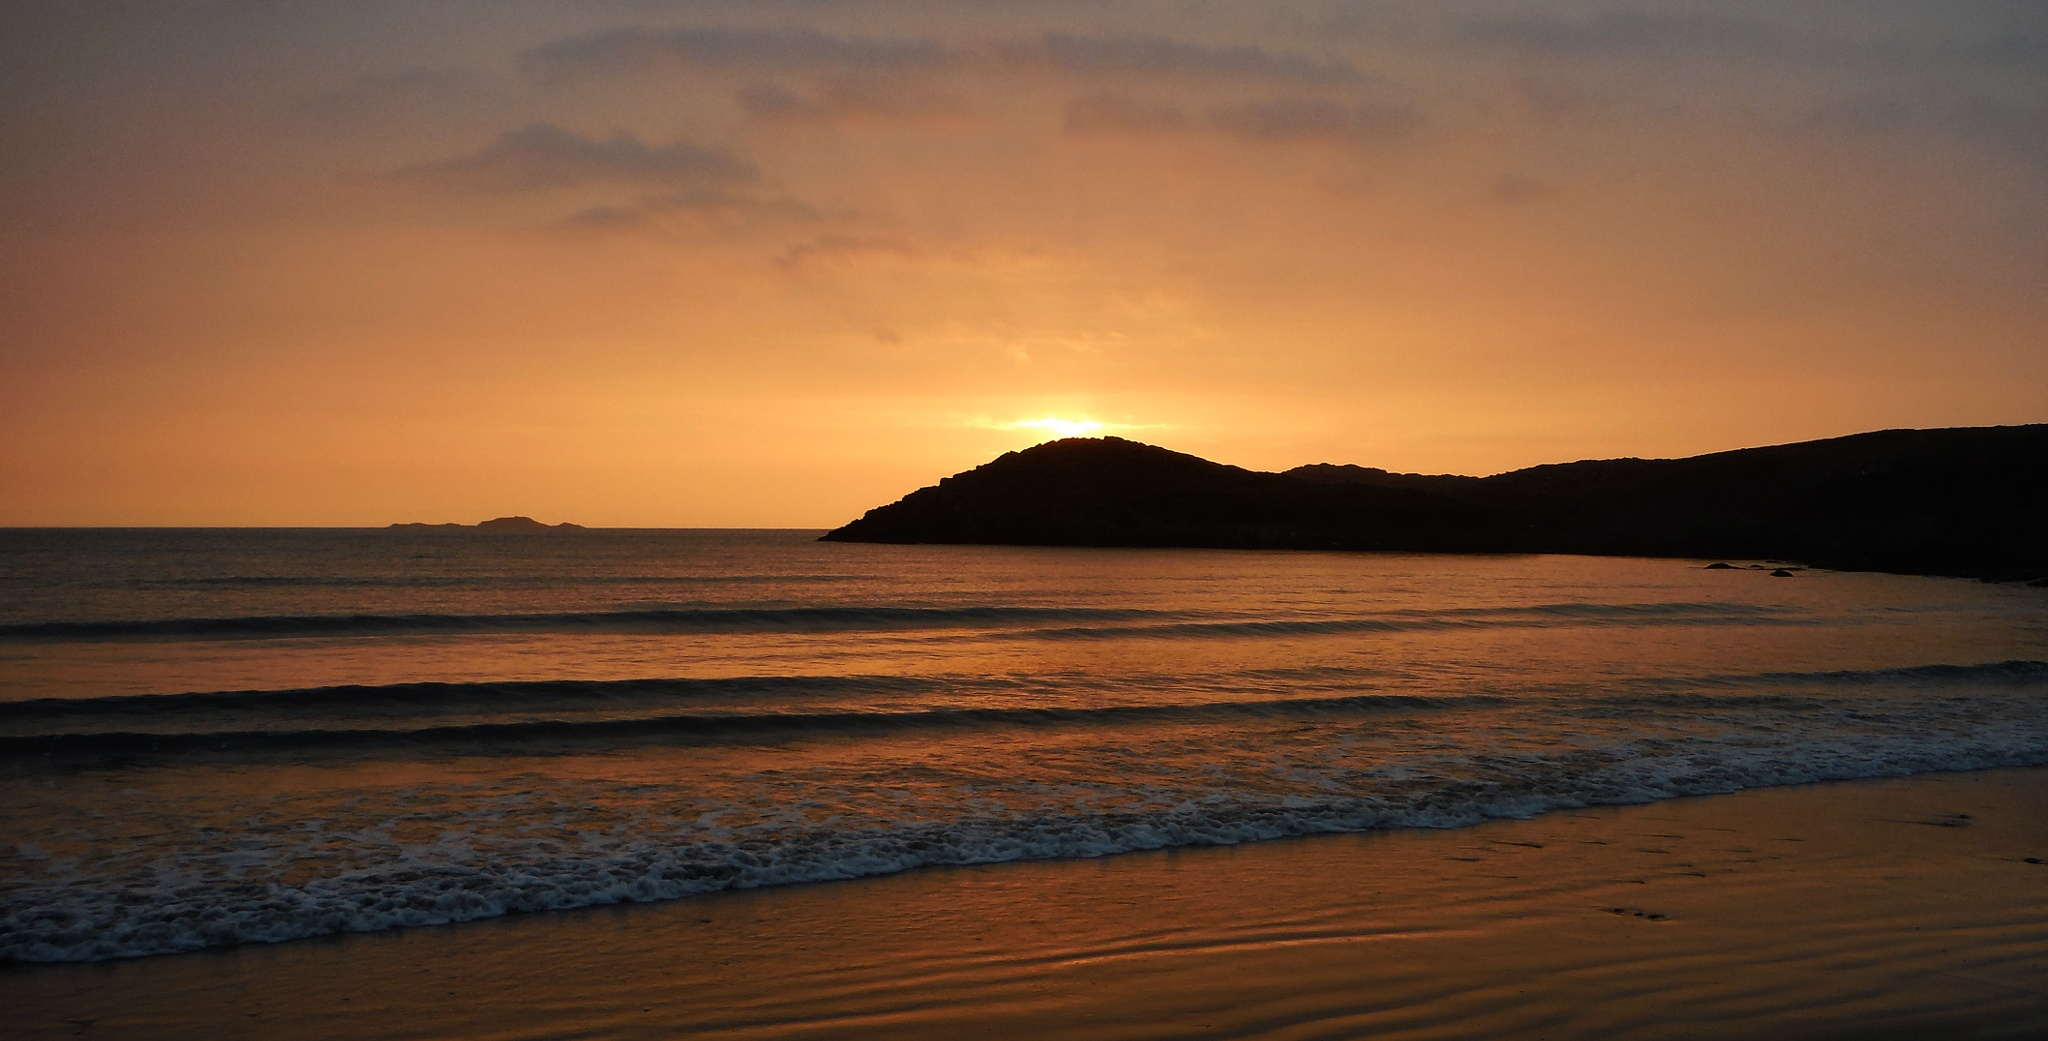 Whitesands Sunset by Piers Hallihan